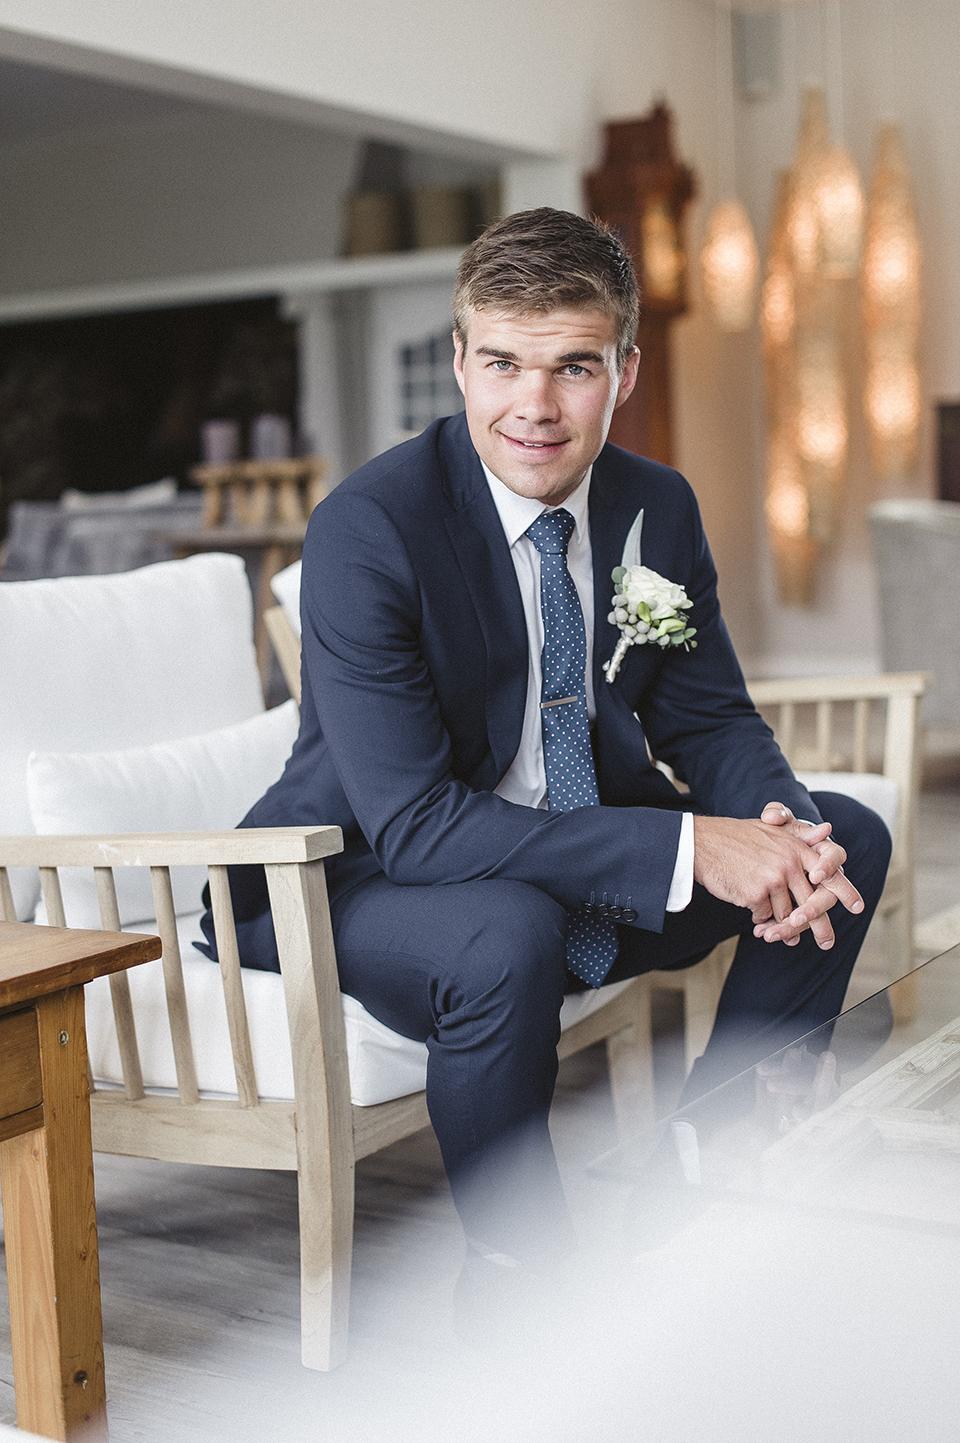 RyanParker_WeddingPhotographer_FineArt_CapeTown_BonaDea_Hermanus_S&A_DSC_1333.jpg